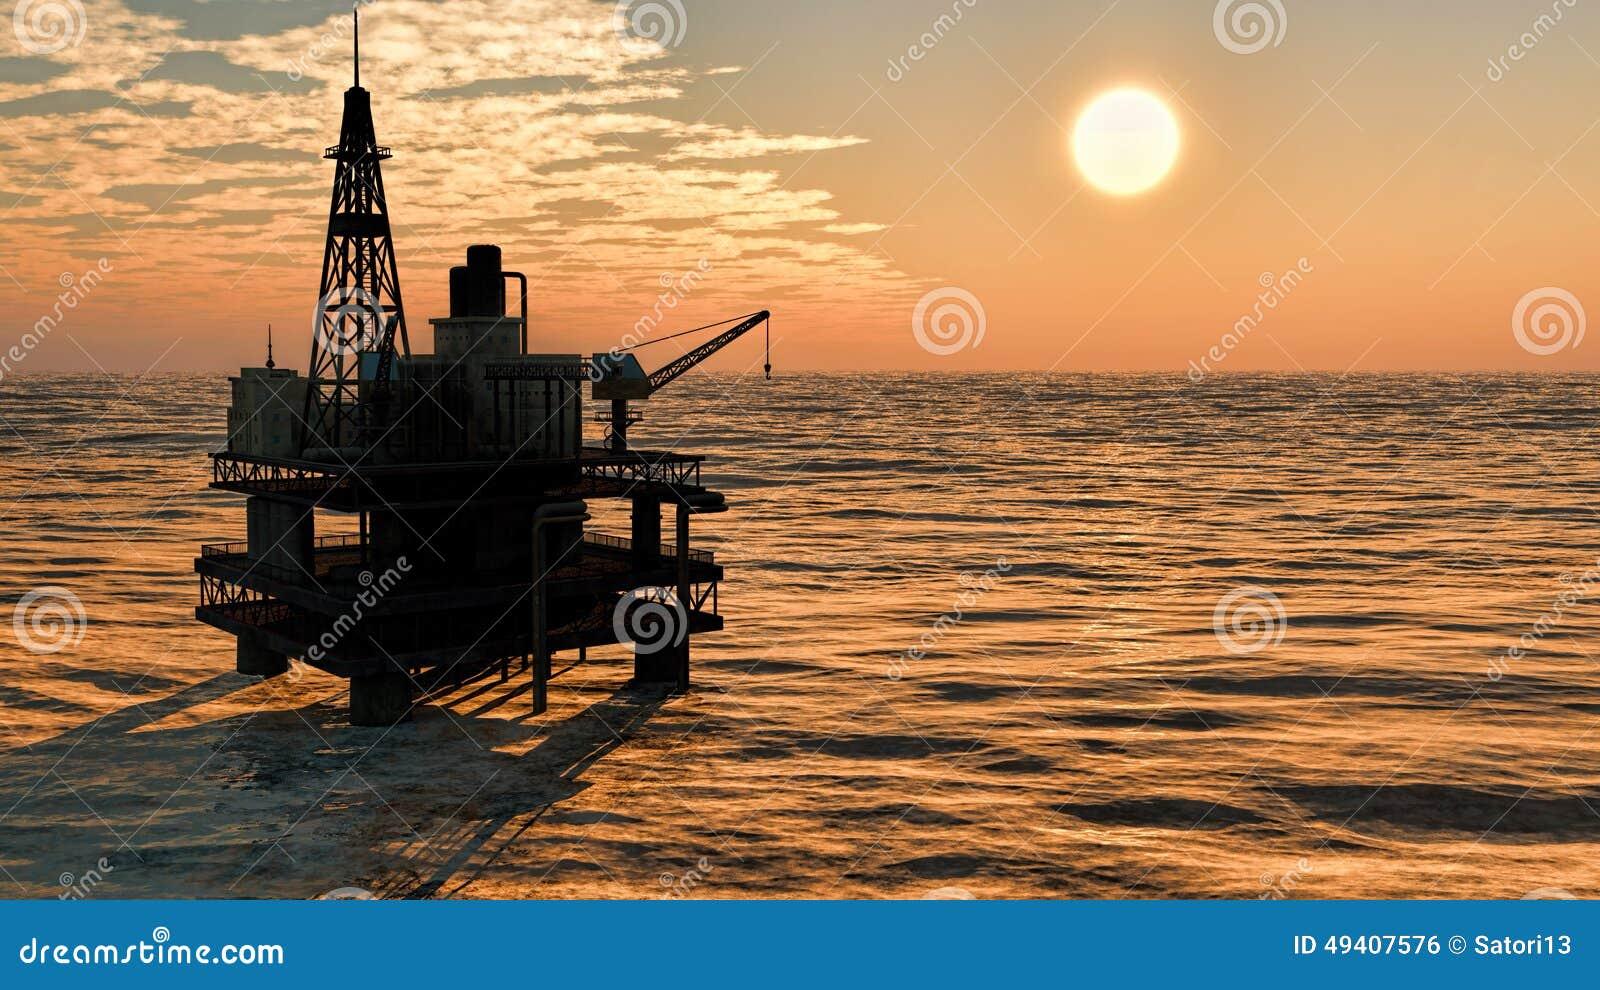 Download Ölplattformplattform stock abbildung. Illustration von kraftstoff - 49407576